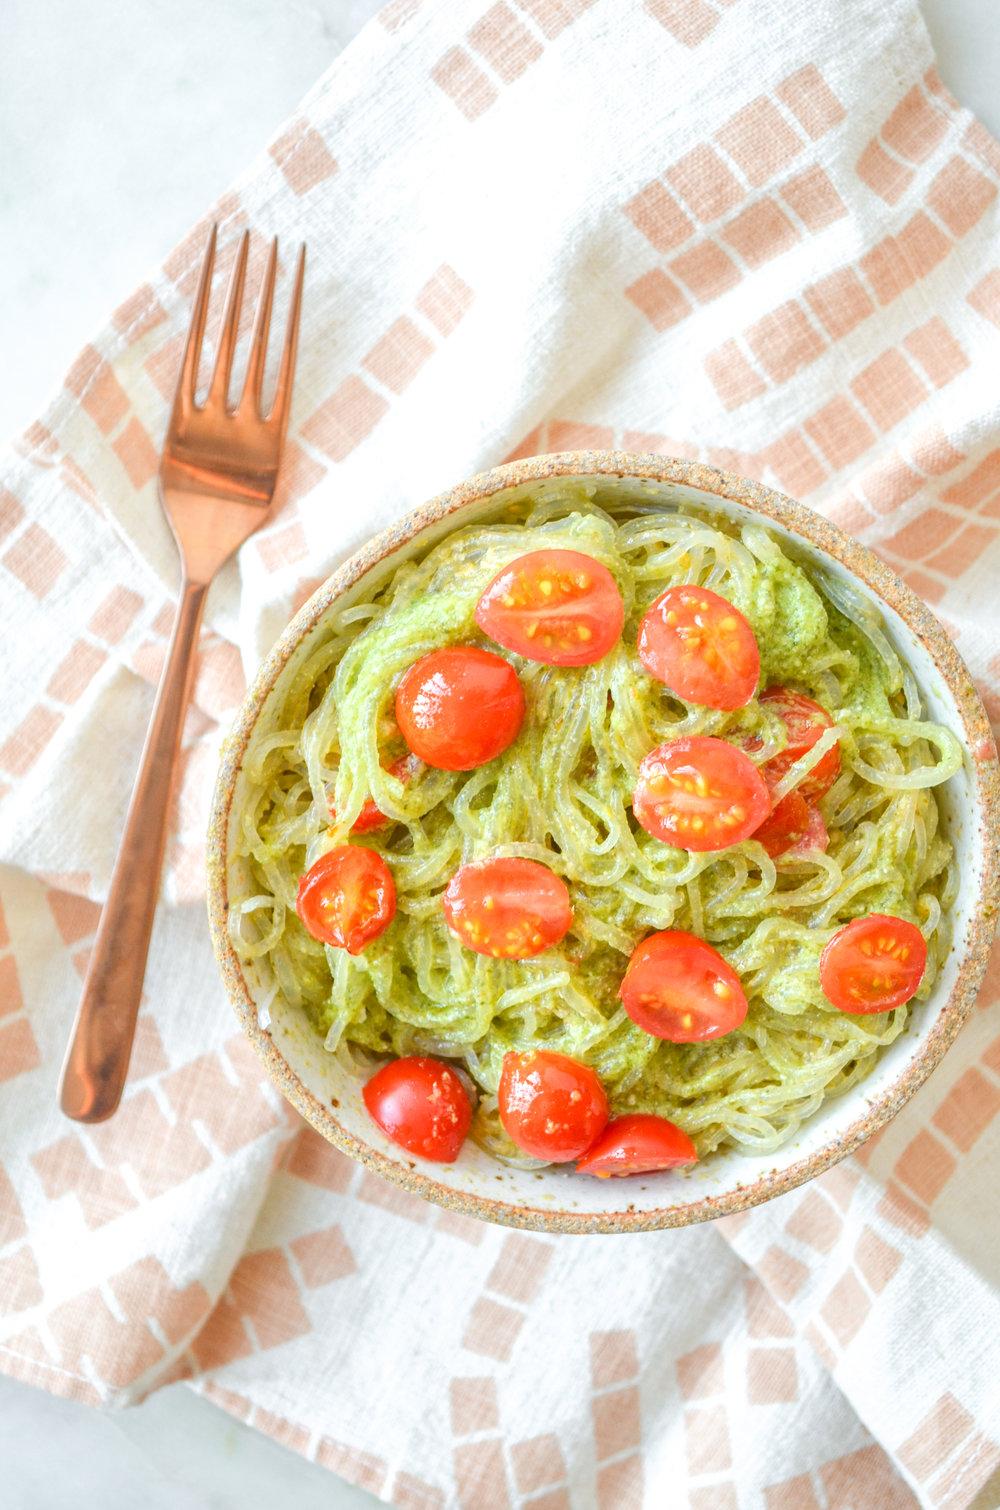 paleo pesto kelp noodles // #ShiraRD #paleo #refinedsugarfree #SnacksbyShira